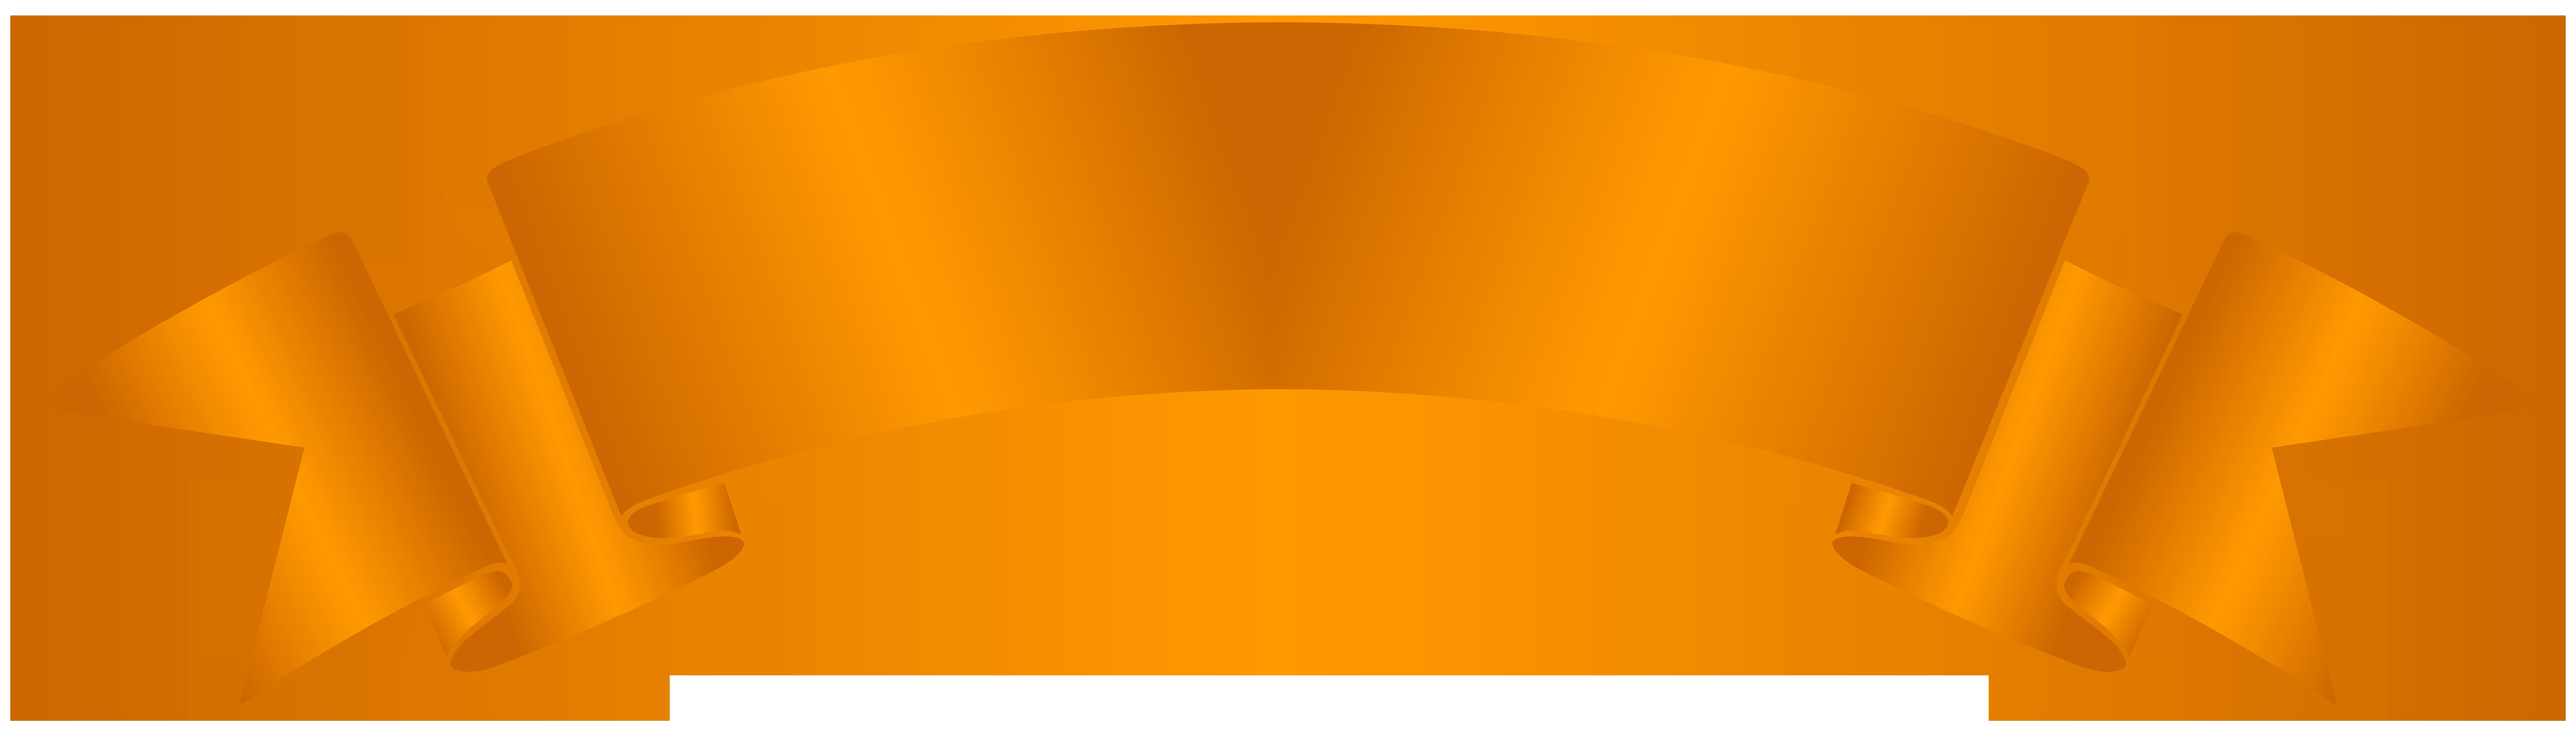 Banner clipart. Orange clip art png